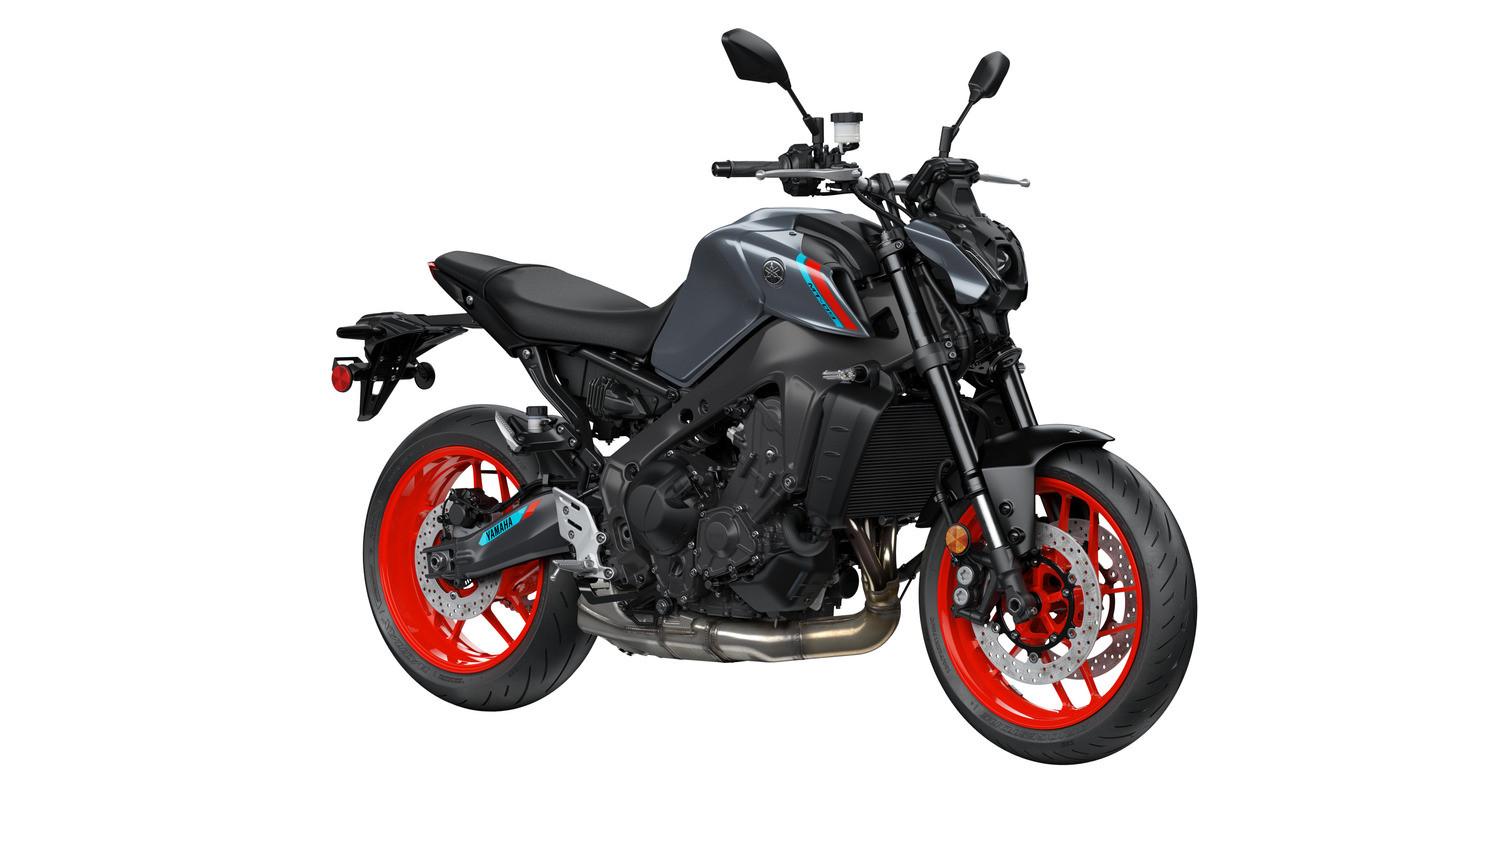 A 2021 Yamaha MT-09. Photo courtesy Yamaha.